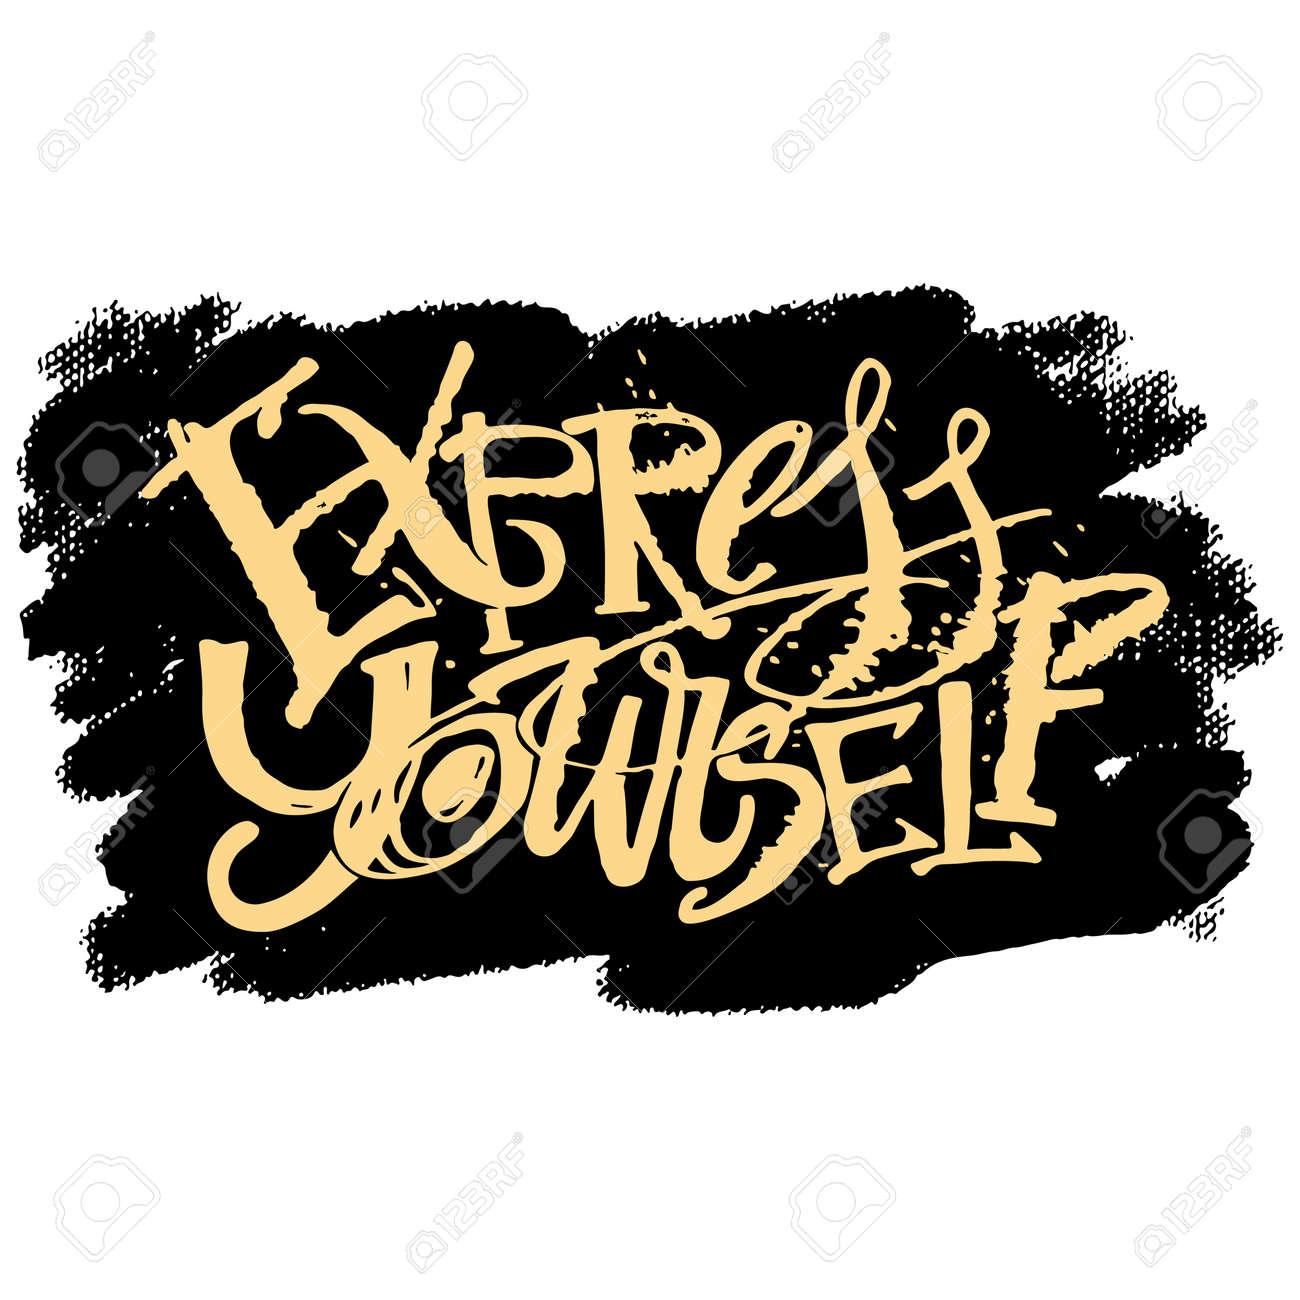 Design poster yourself - Express Yourself Concept Hand Lettering Motivation Poster Artistic Modern Ink Lettering Design For A